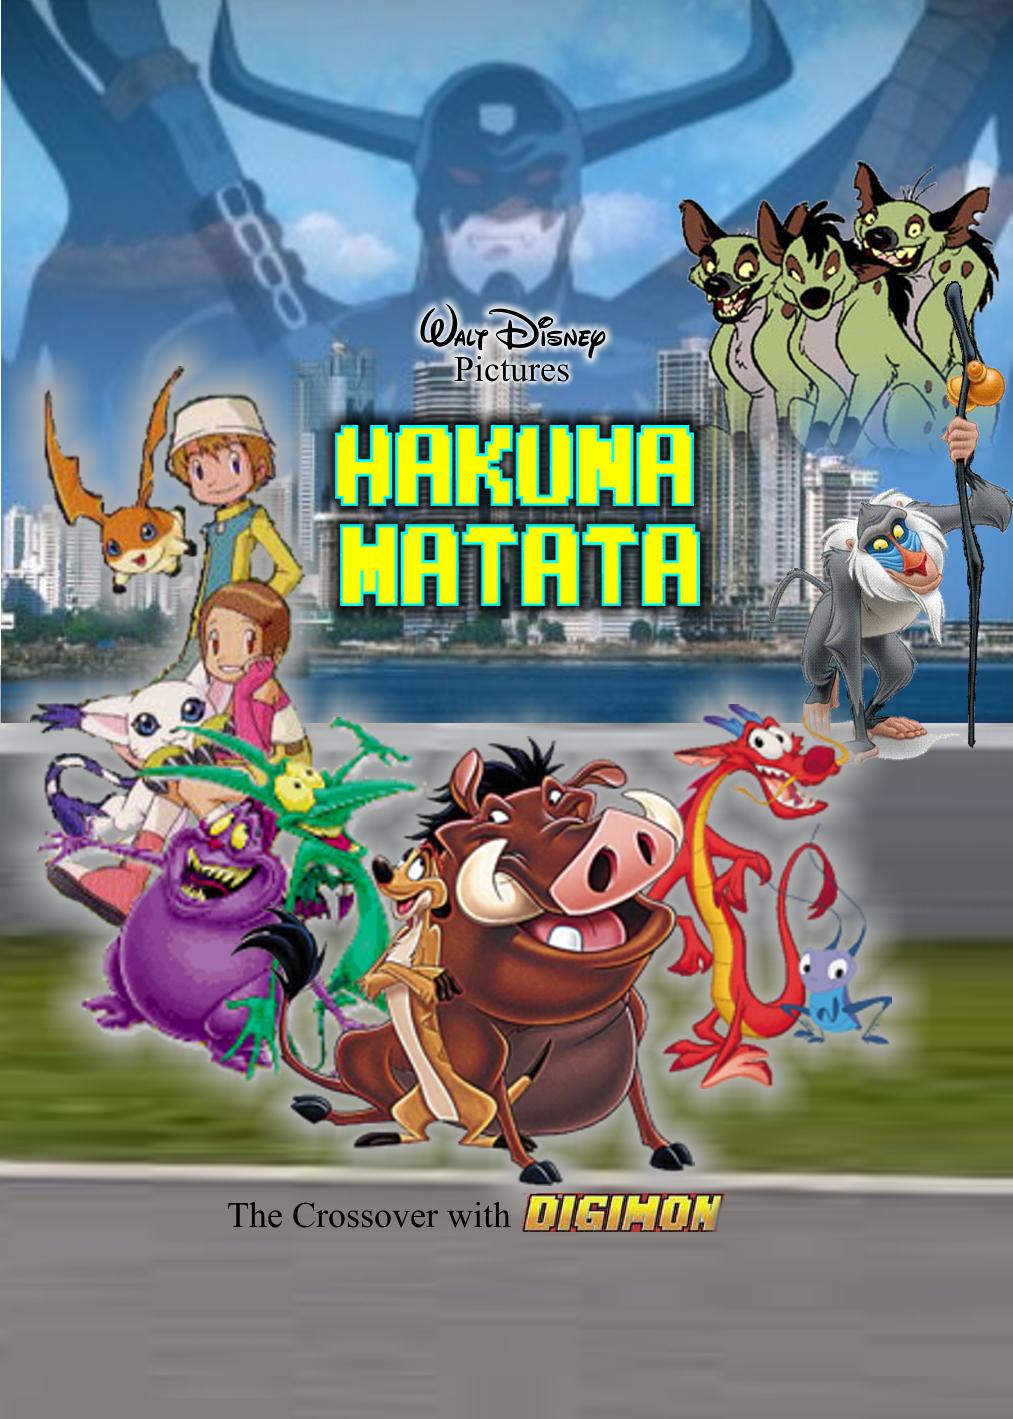 disney u0026 39 s hakuna matata  in the crossover with digimon